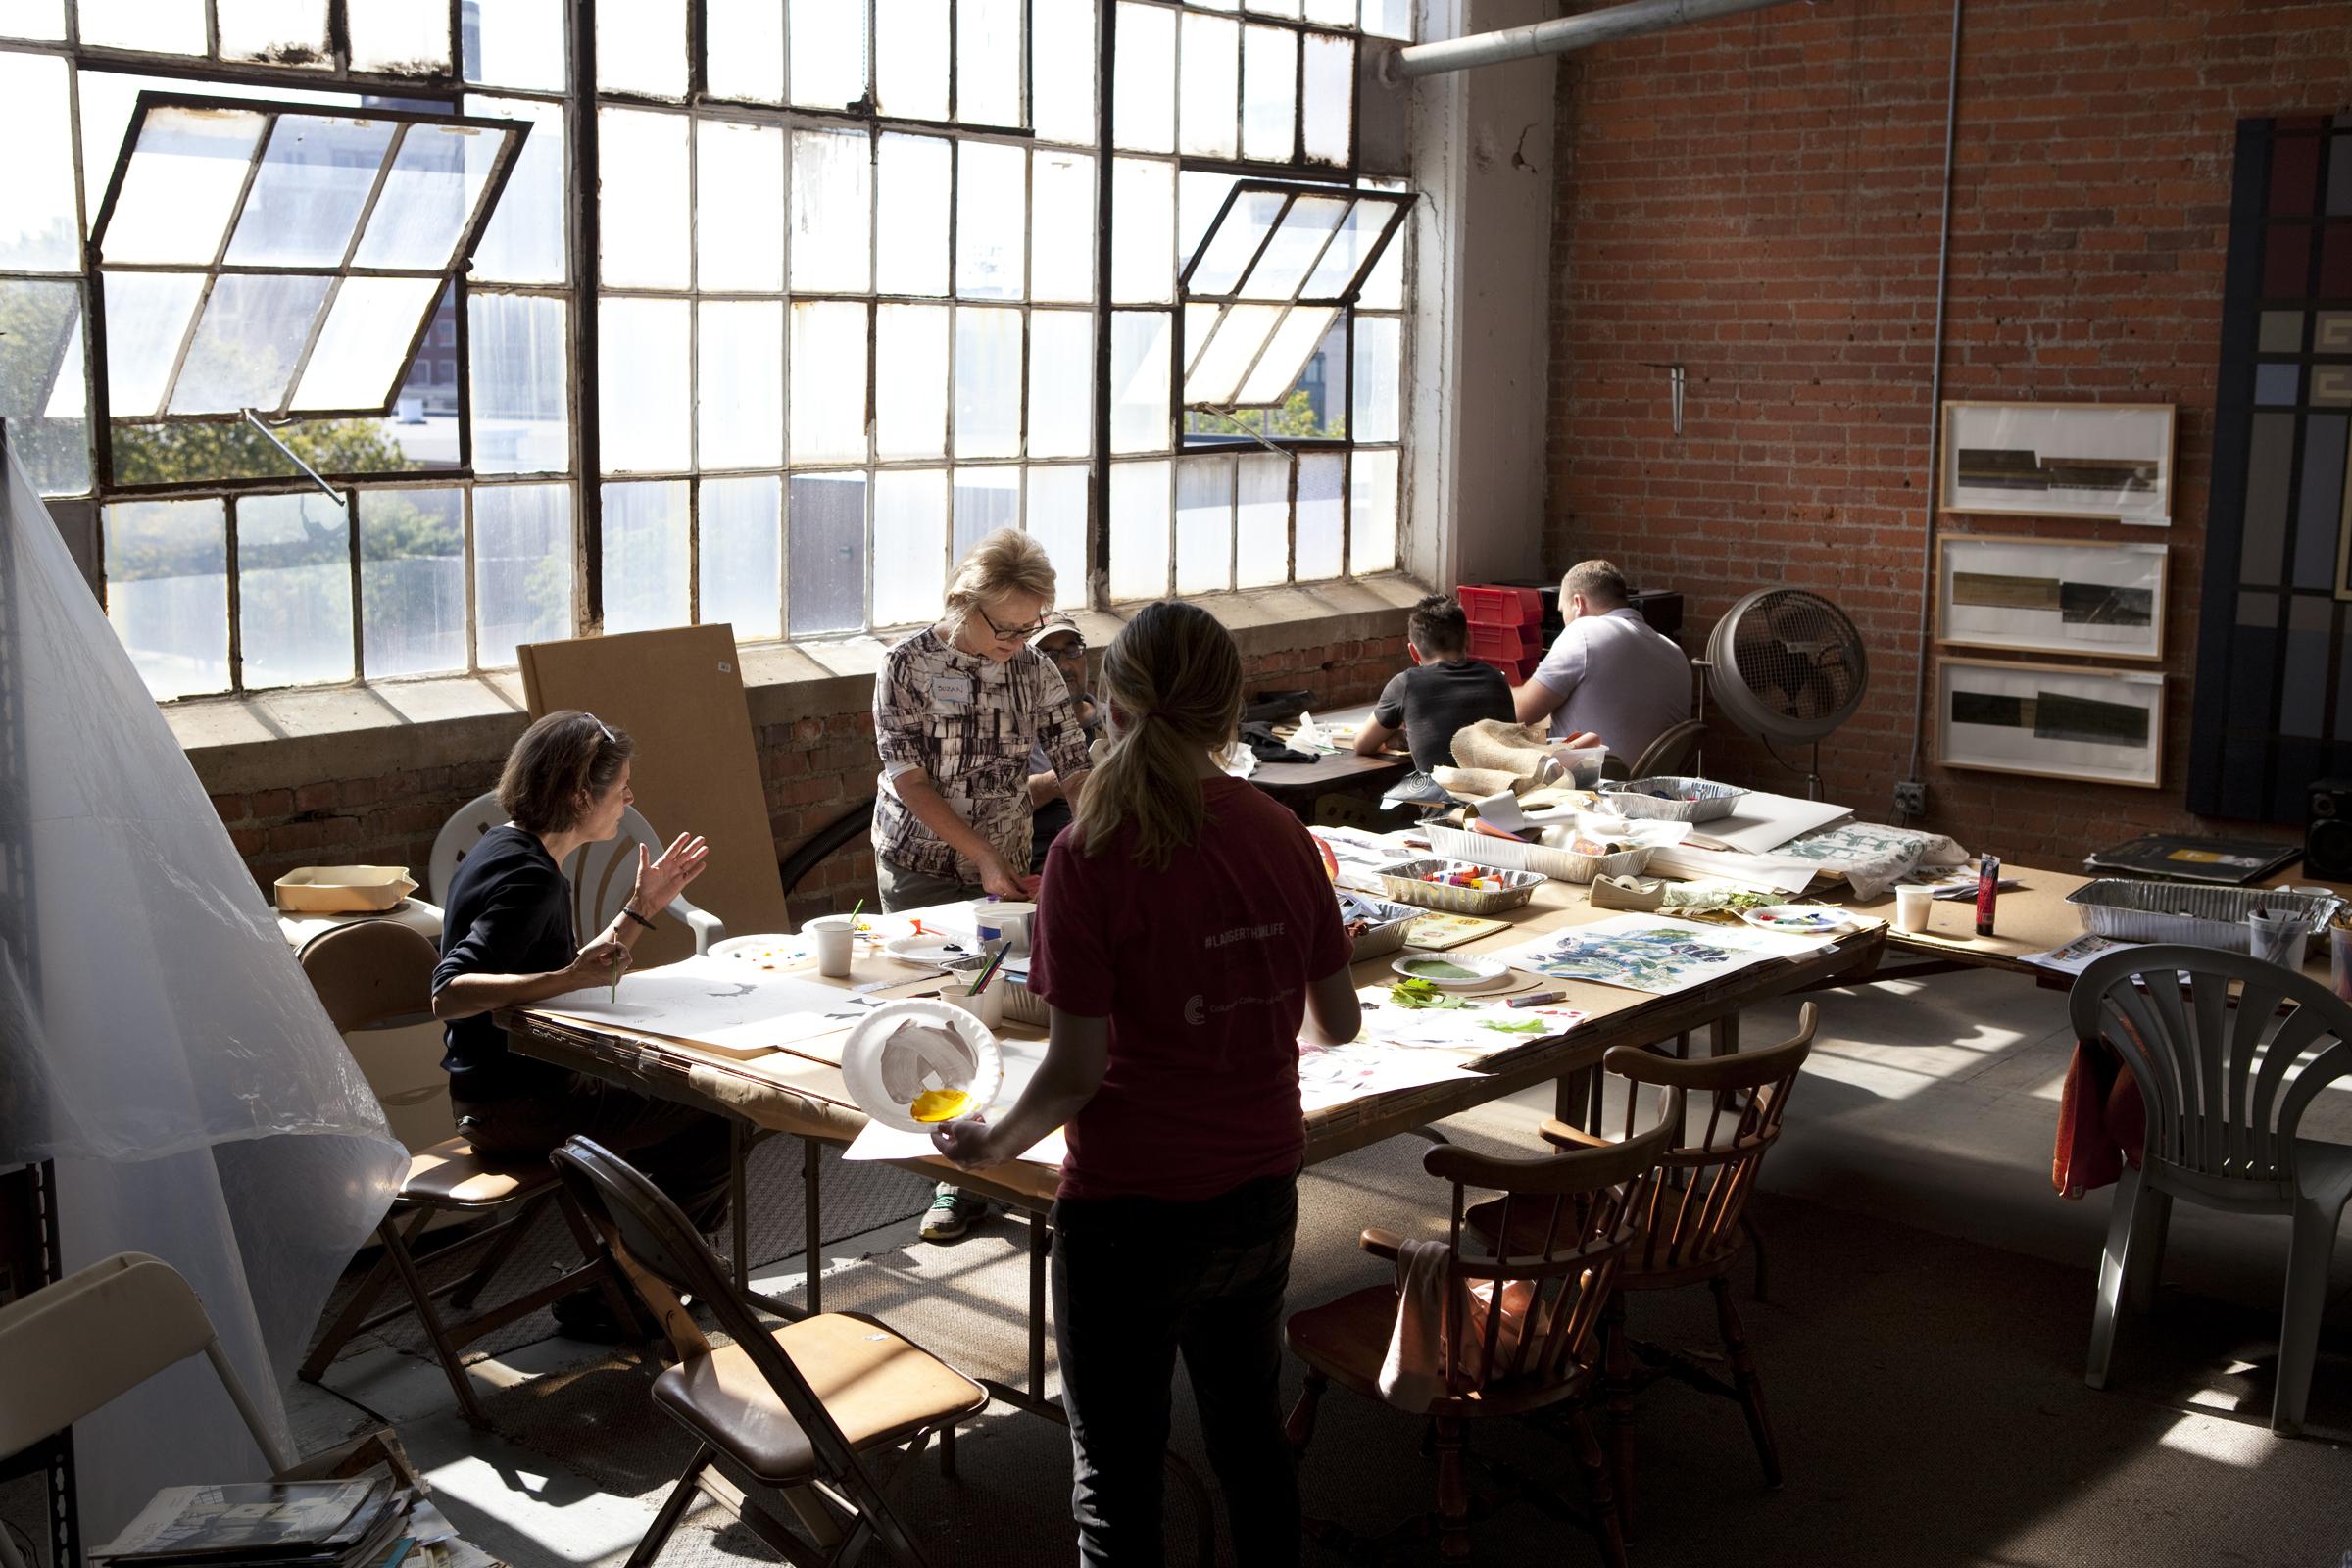 Superior Ave. banner design sessions in Bill's studio